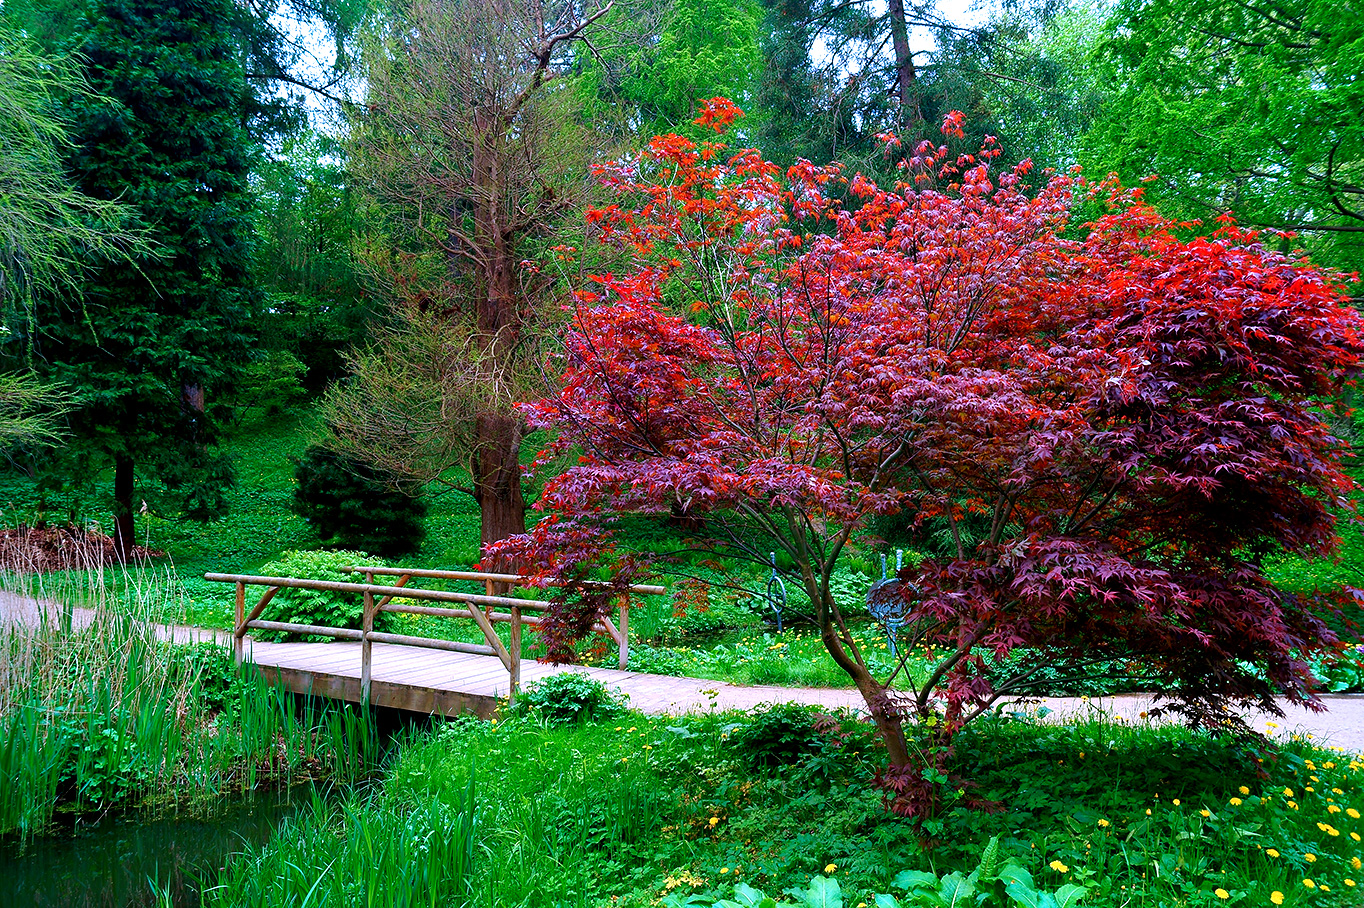 Alter Botanischer Garten Kiel: Alter Botanischer Garten Kiel Foto & Bild